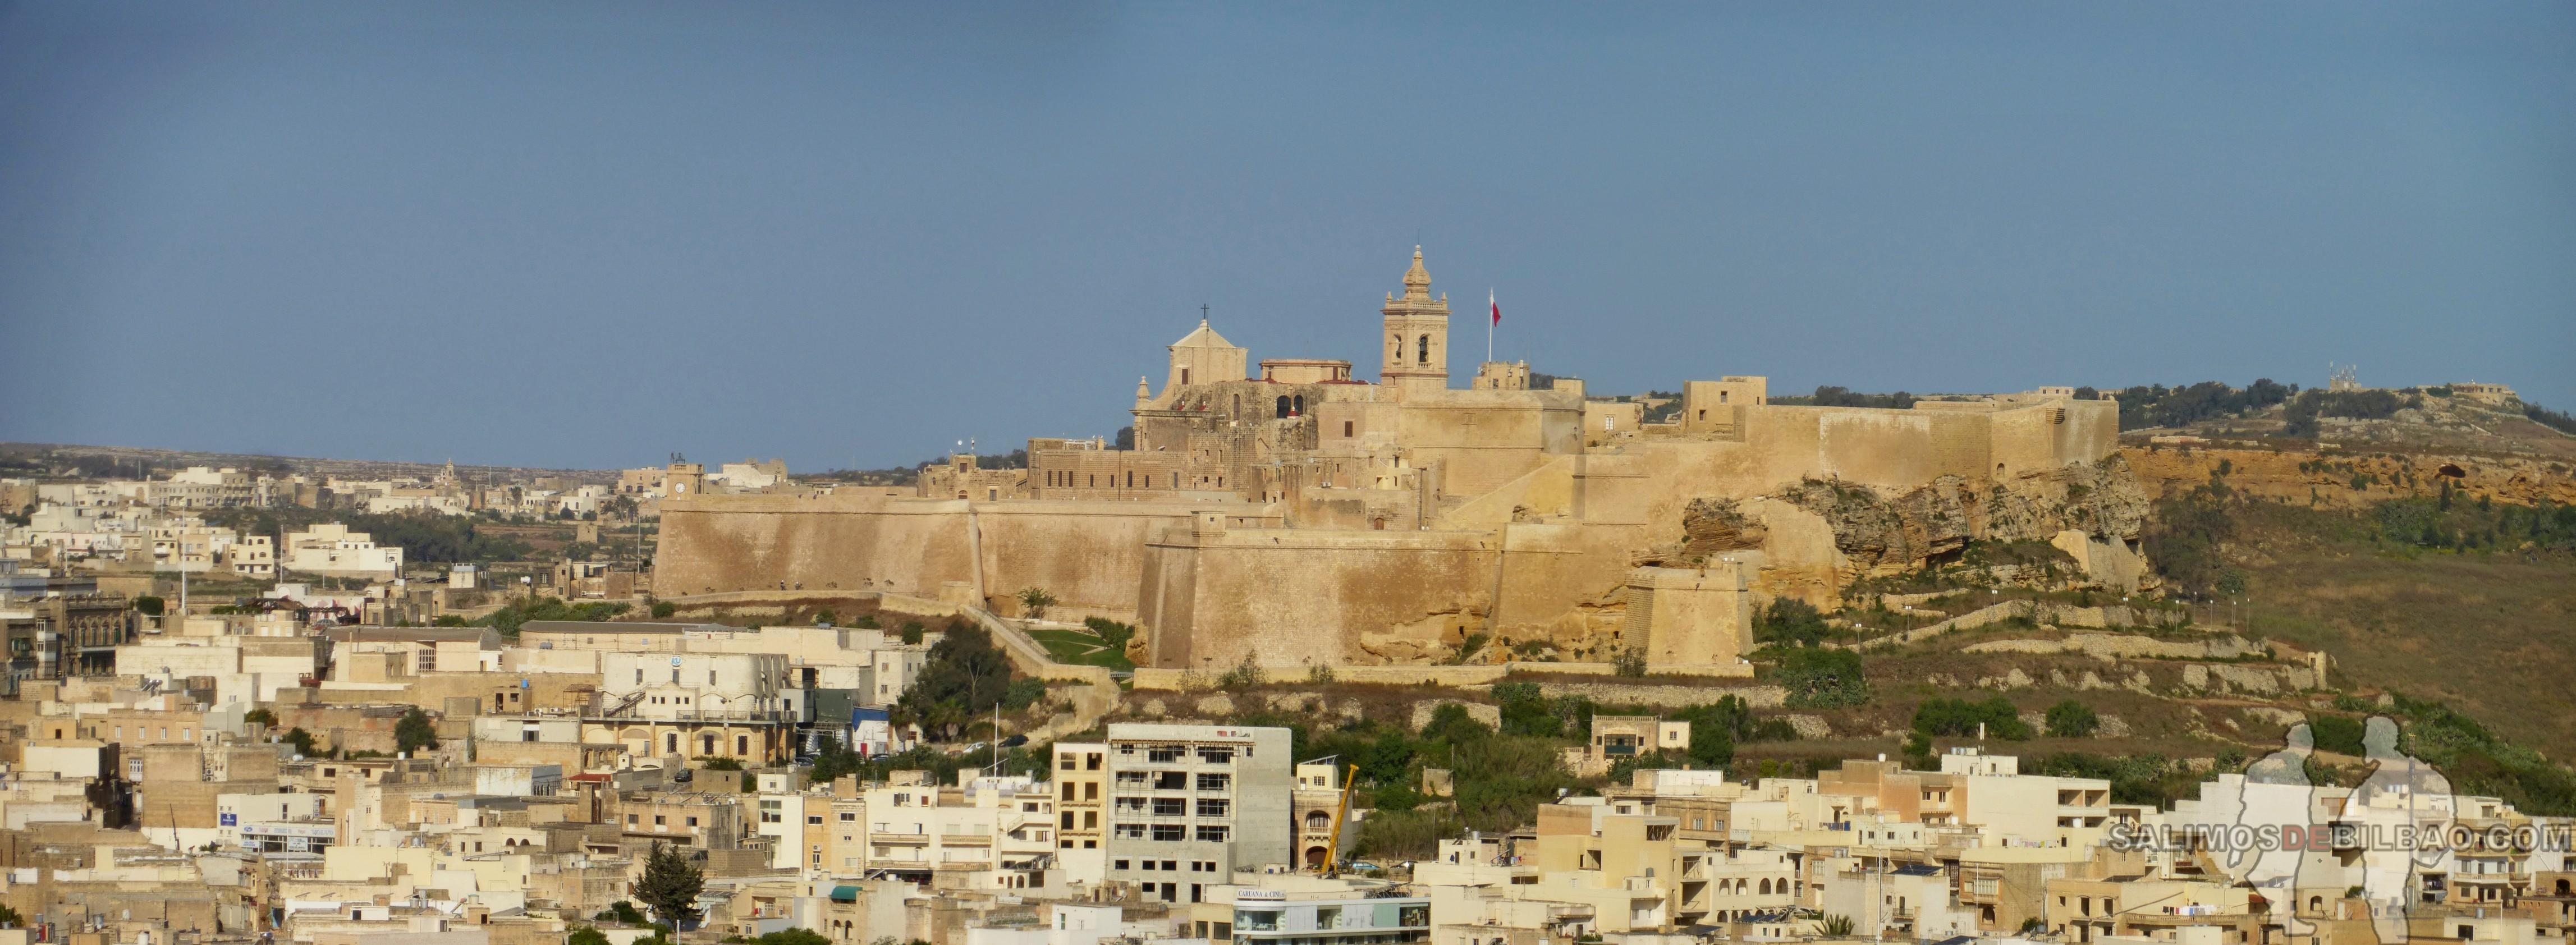 0513. Pano, Ciudadela de Victoria desde Xaghra, Gozo